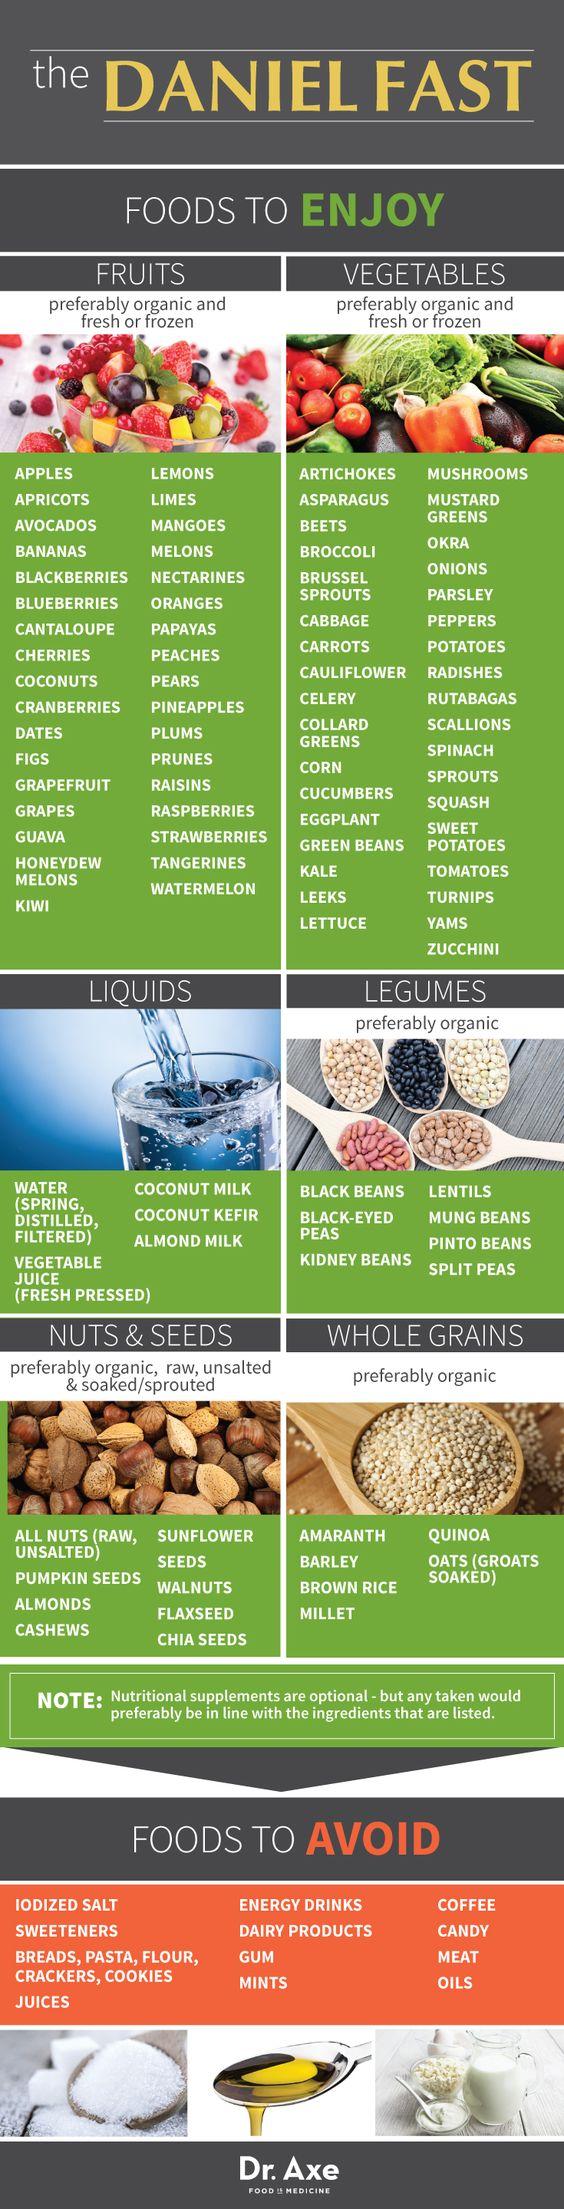 Daniel Fast: Benefits, Food List and Breakthrough Secrets